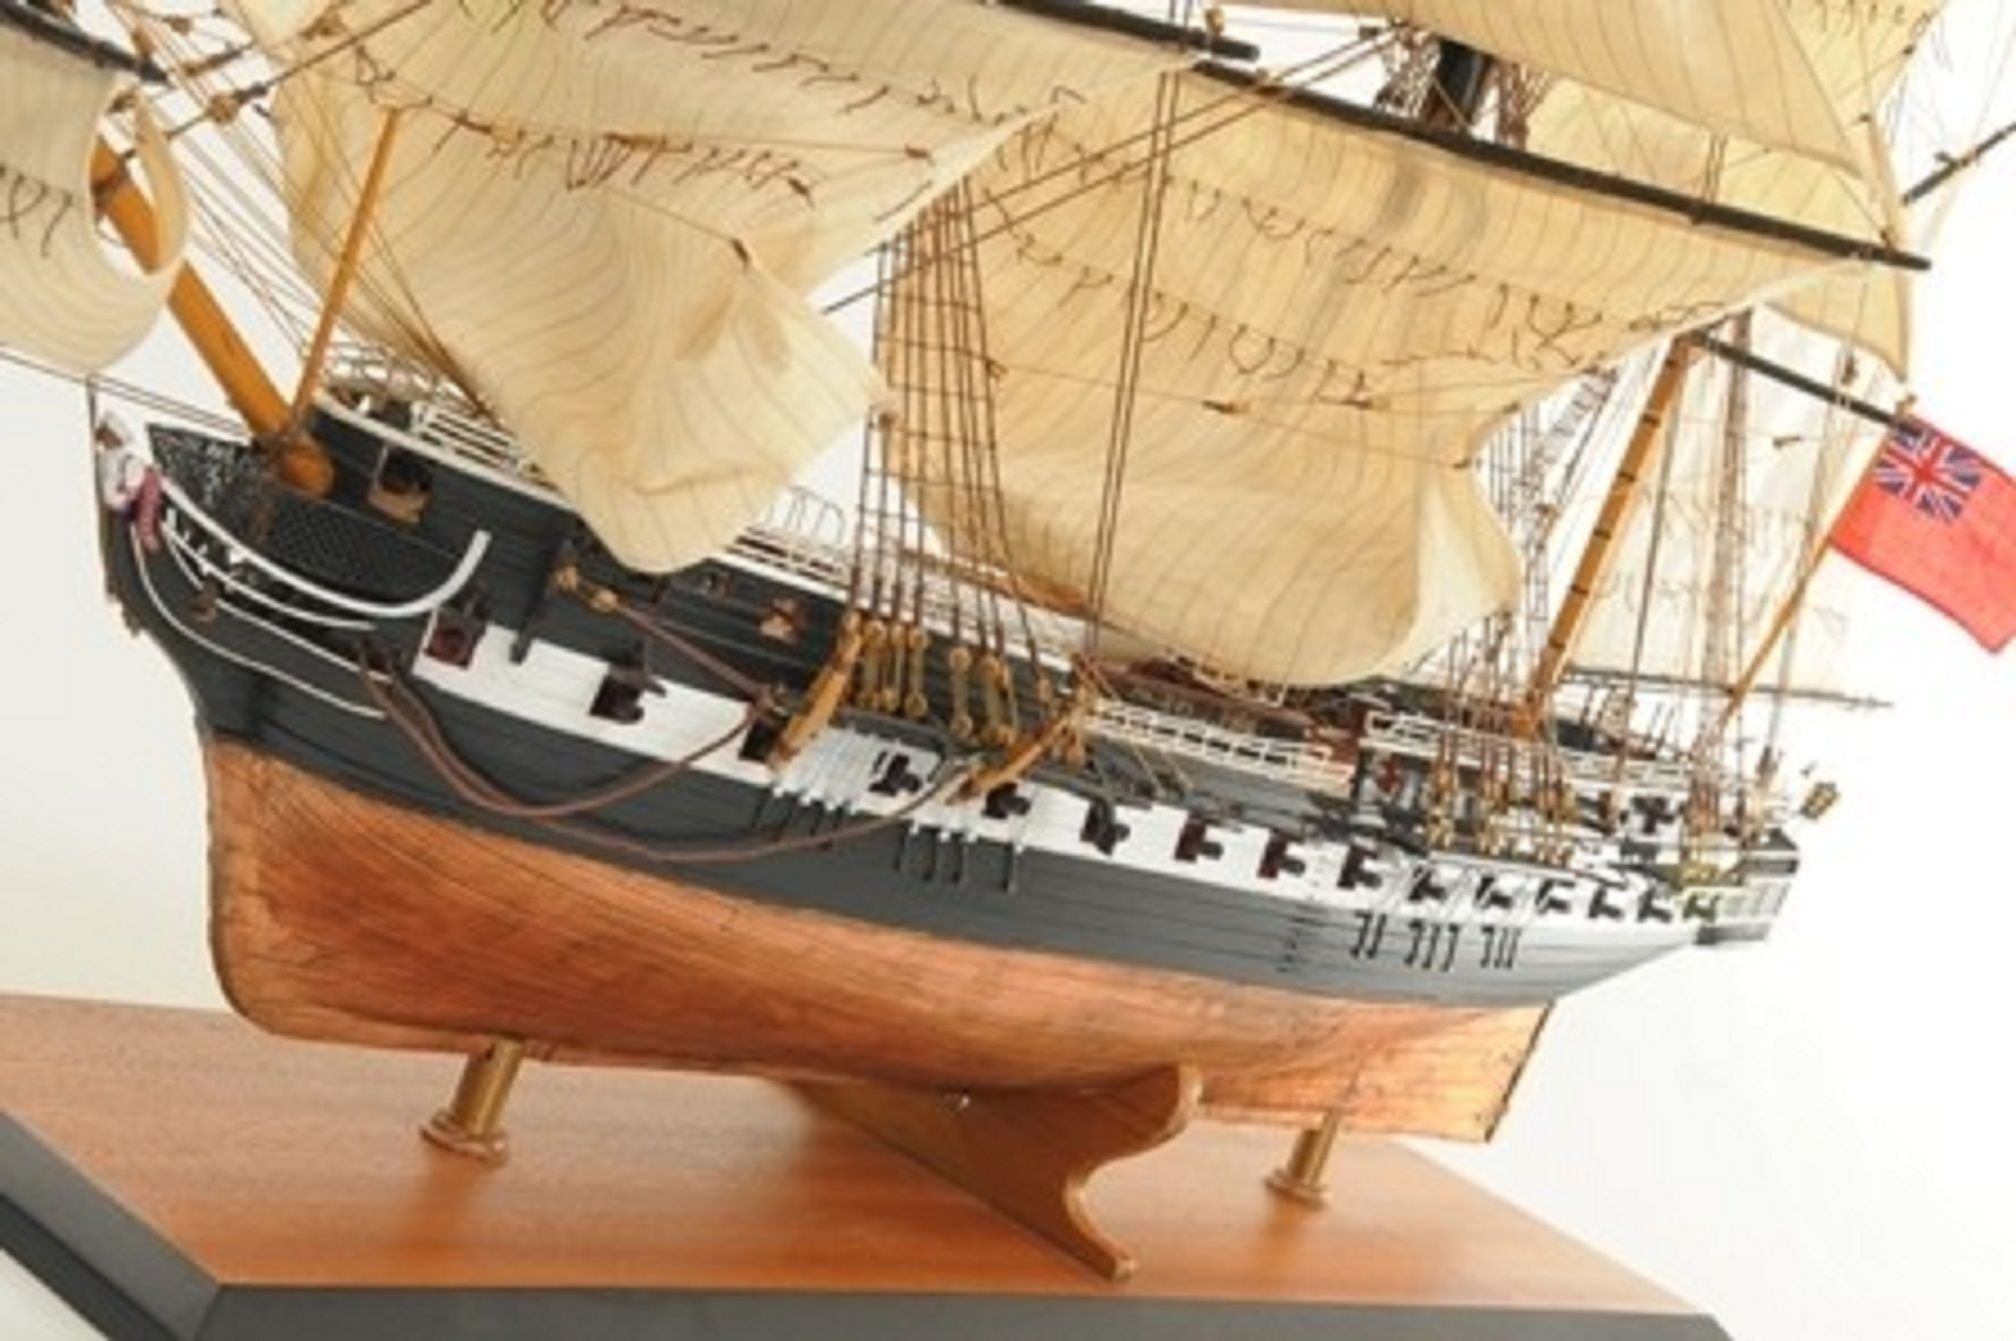 1059-7418-HMS-Trincomalee-Ship-Model-Premier-Range